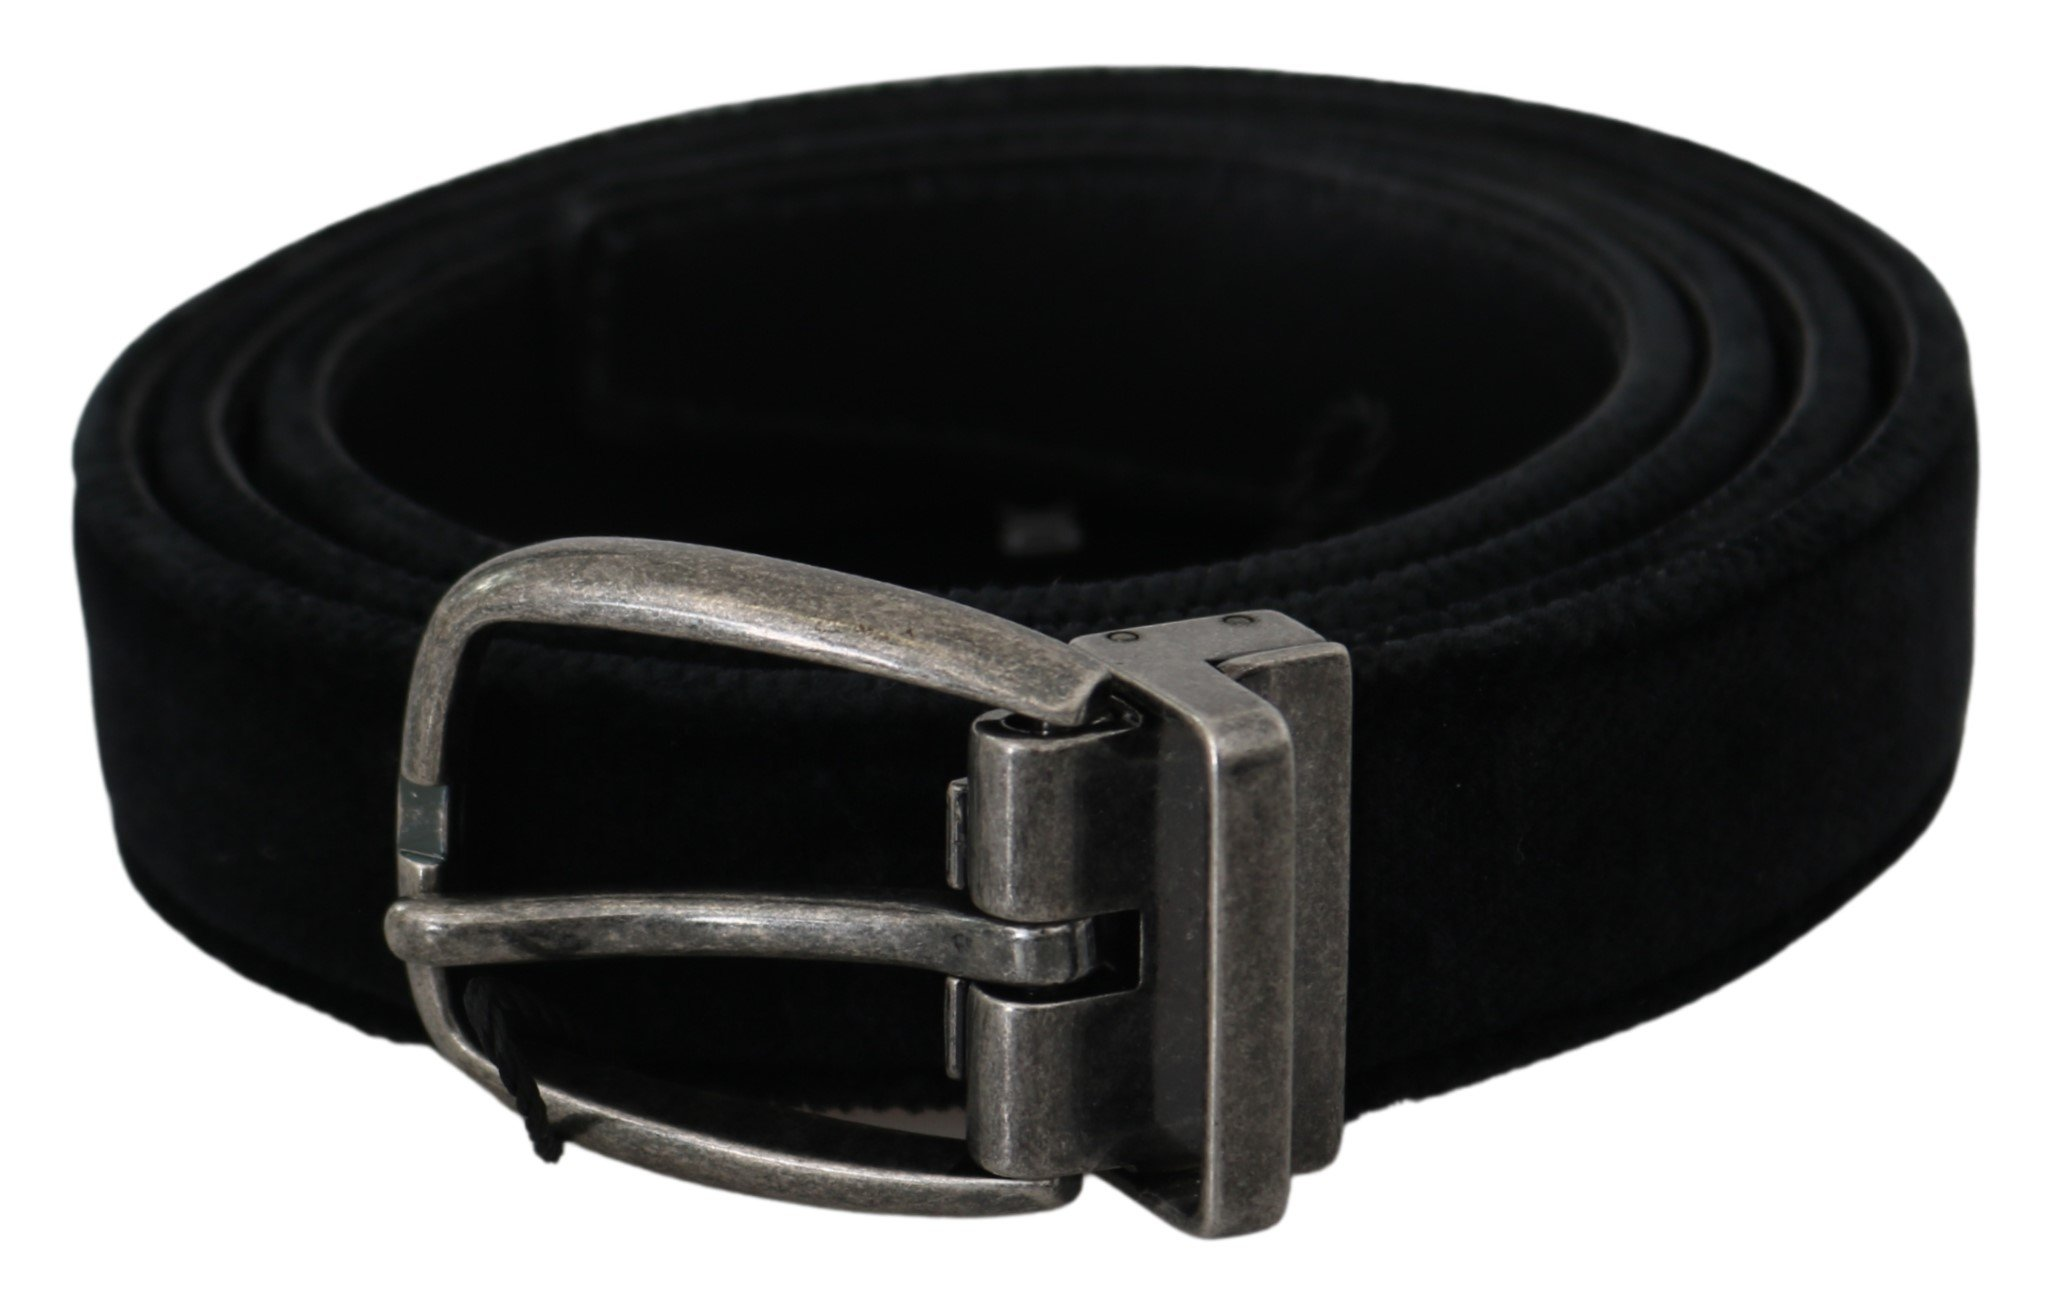 Black Velvet Leather Silver Oval Buckle Belt - 115 cm / 46 Inches